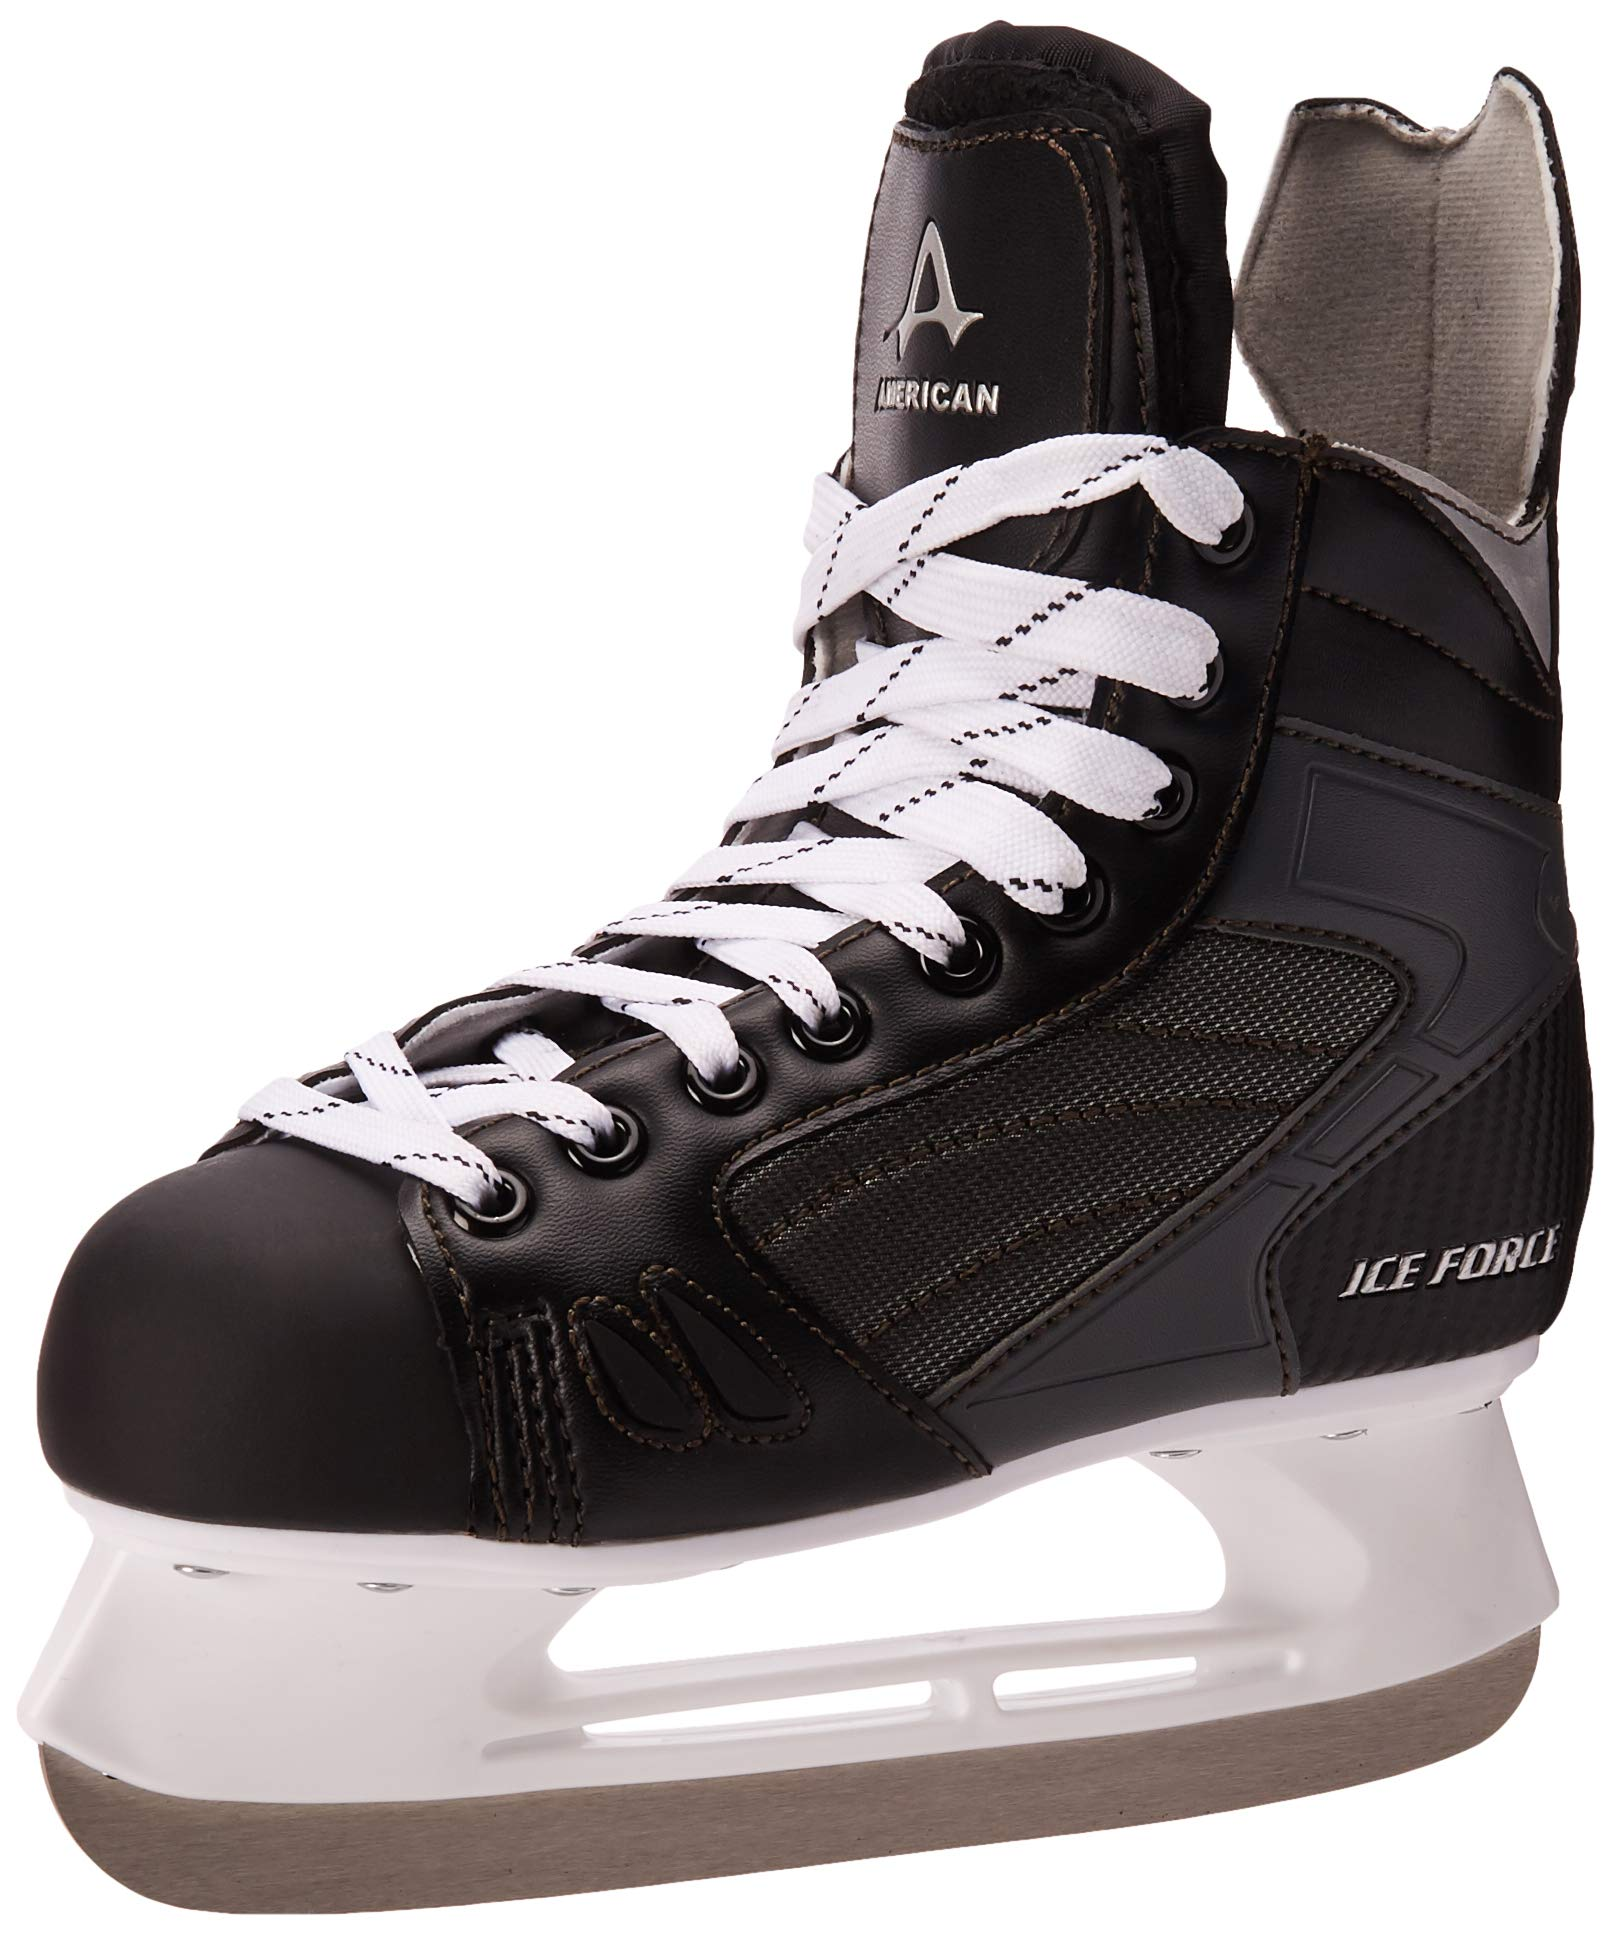 American Athletic Shoe Boy's Ice Force Hockey Skates, Black, 4 Y